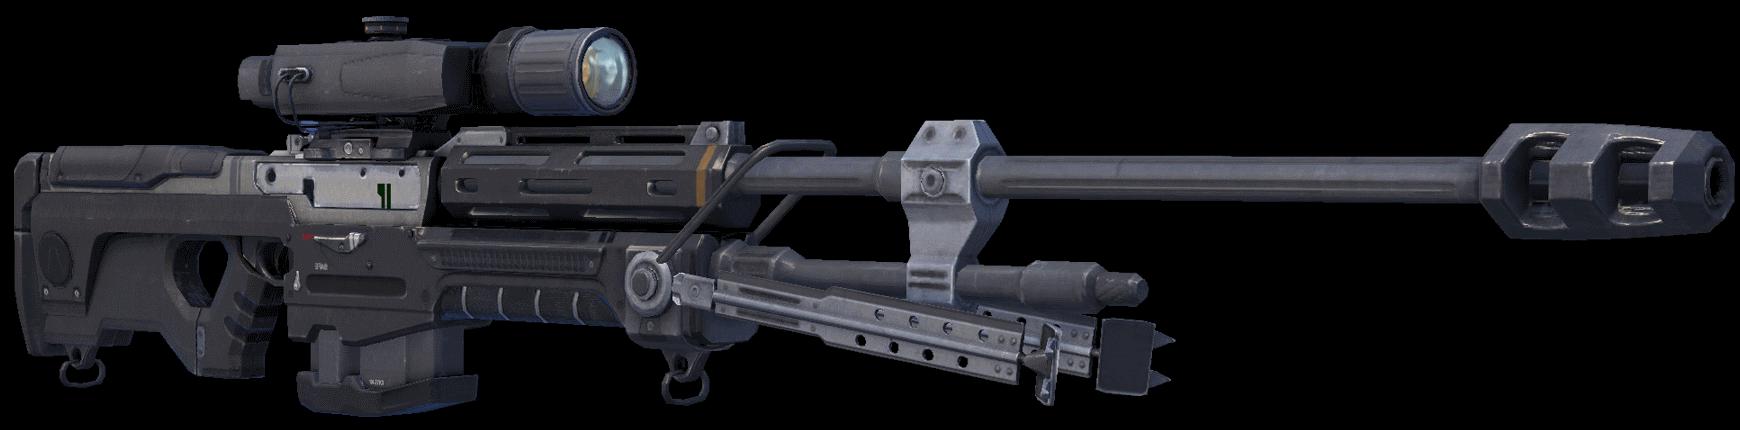 stock Rifle system anti mat. Transparent sniper halo.